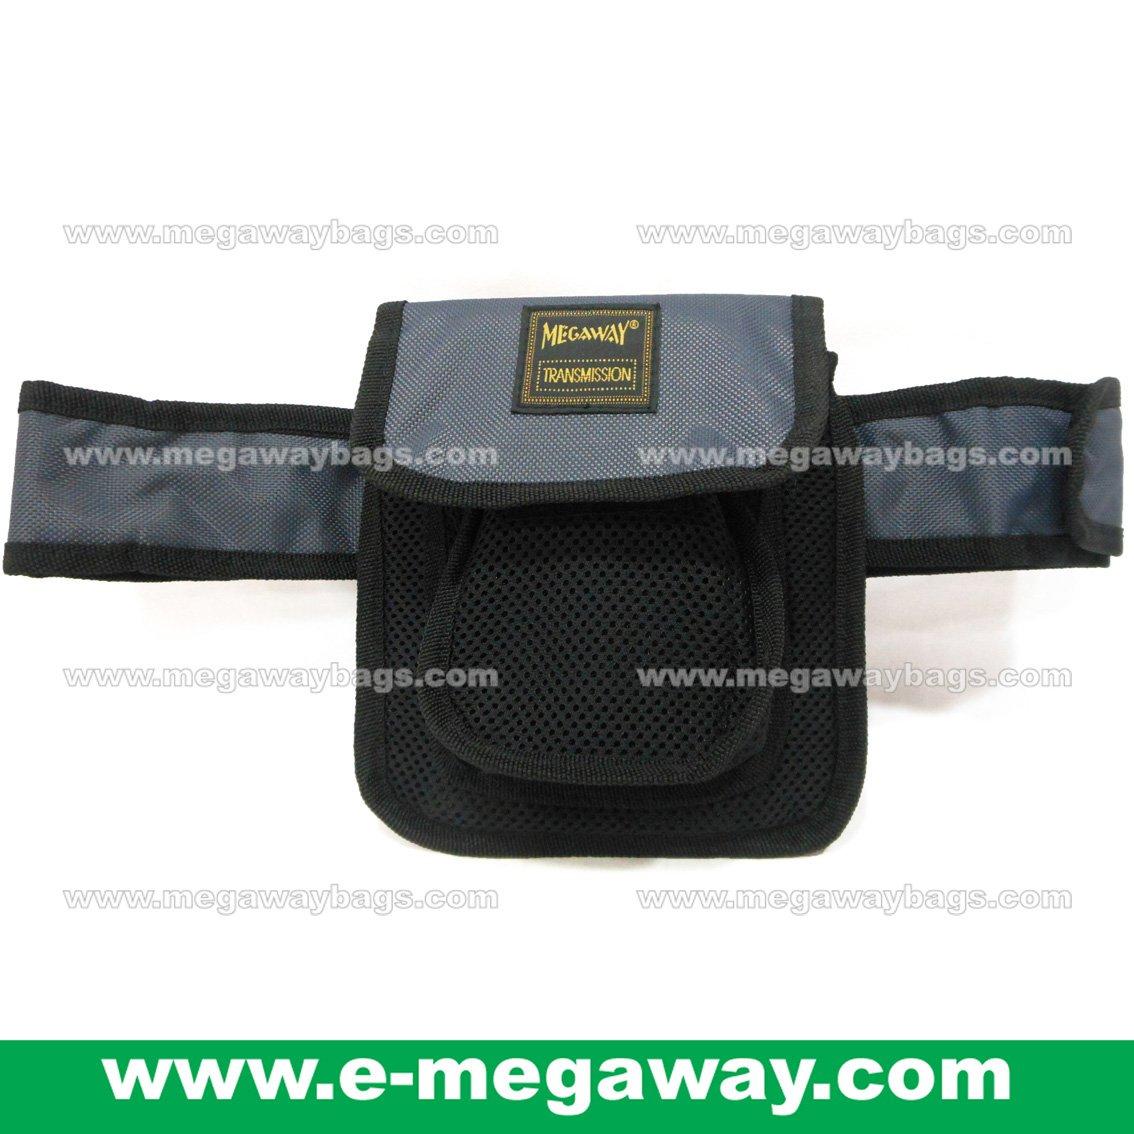 Designer Waist Bag (Detachable Belt) Purse Pouch Wallet Handbag MegawayBags #CC-0934